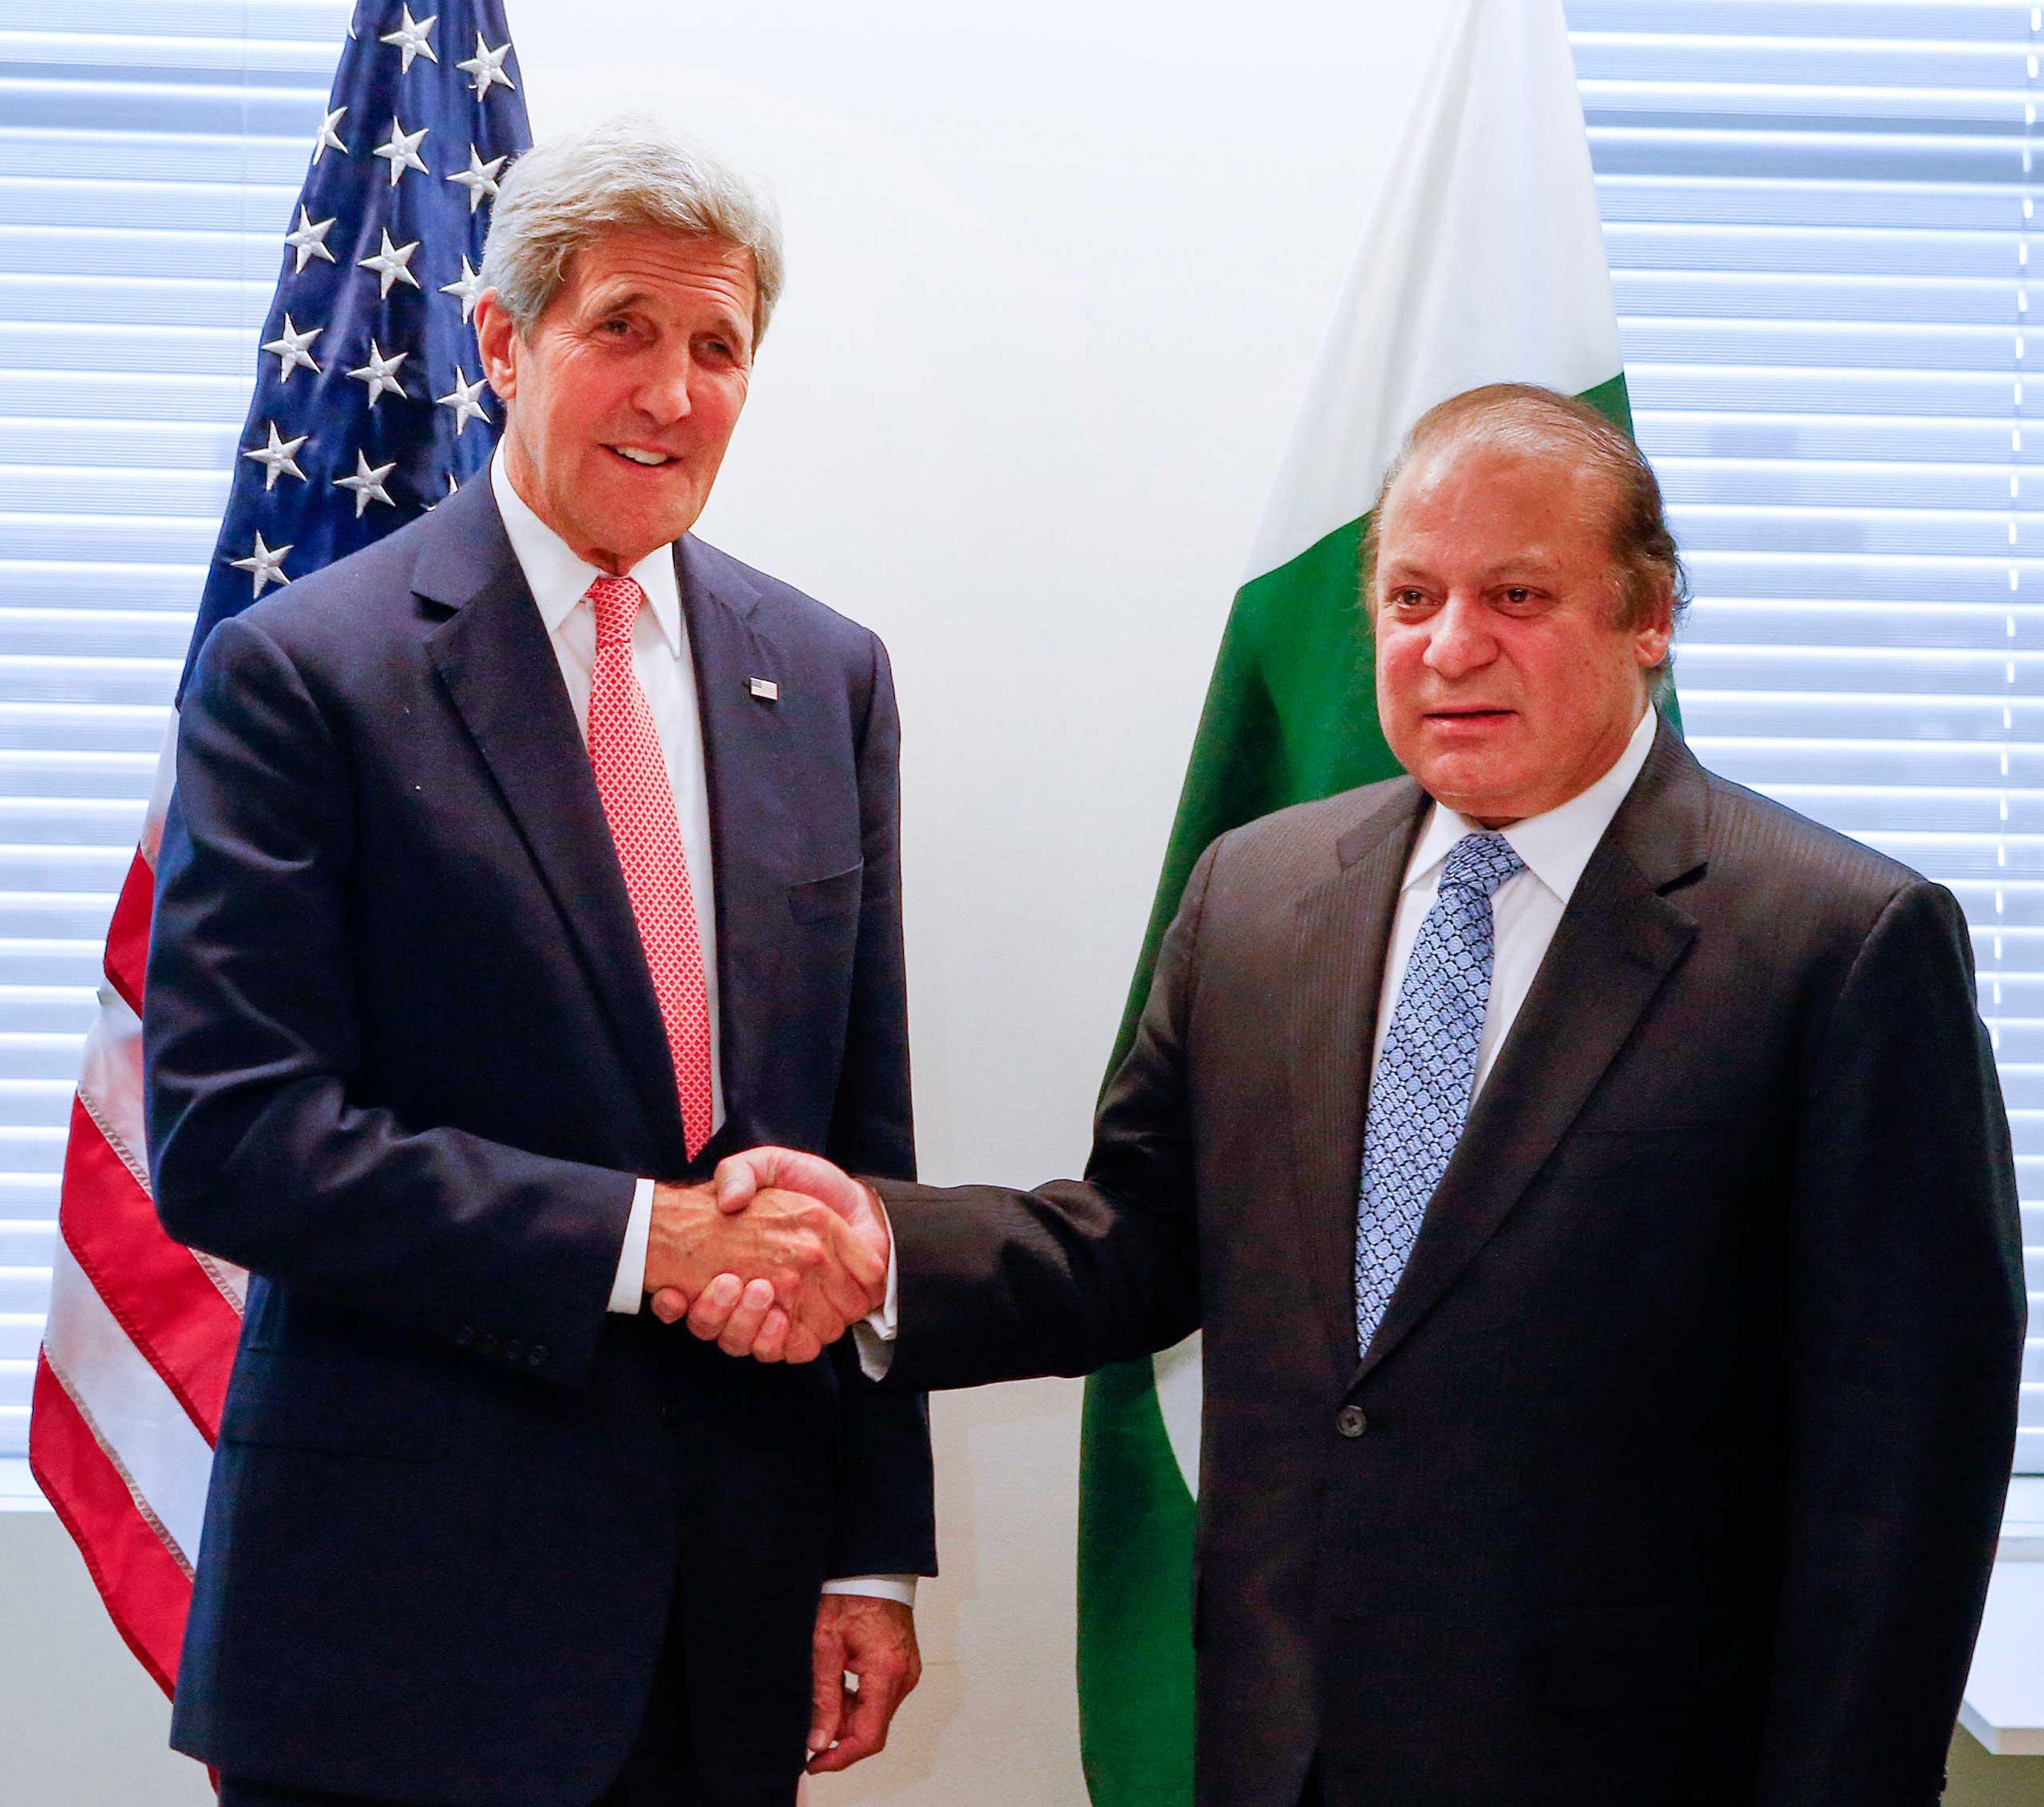 U.S. Secretary of State John Kerry, left, meets with Pakistani Prime Minister Nawaz Sharif at United Nations headquarters, Sept. 27, 2015.